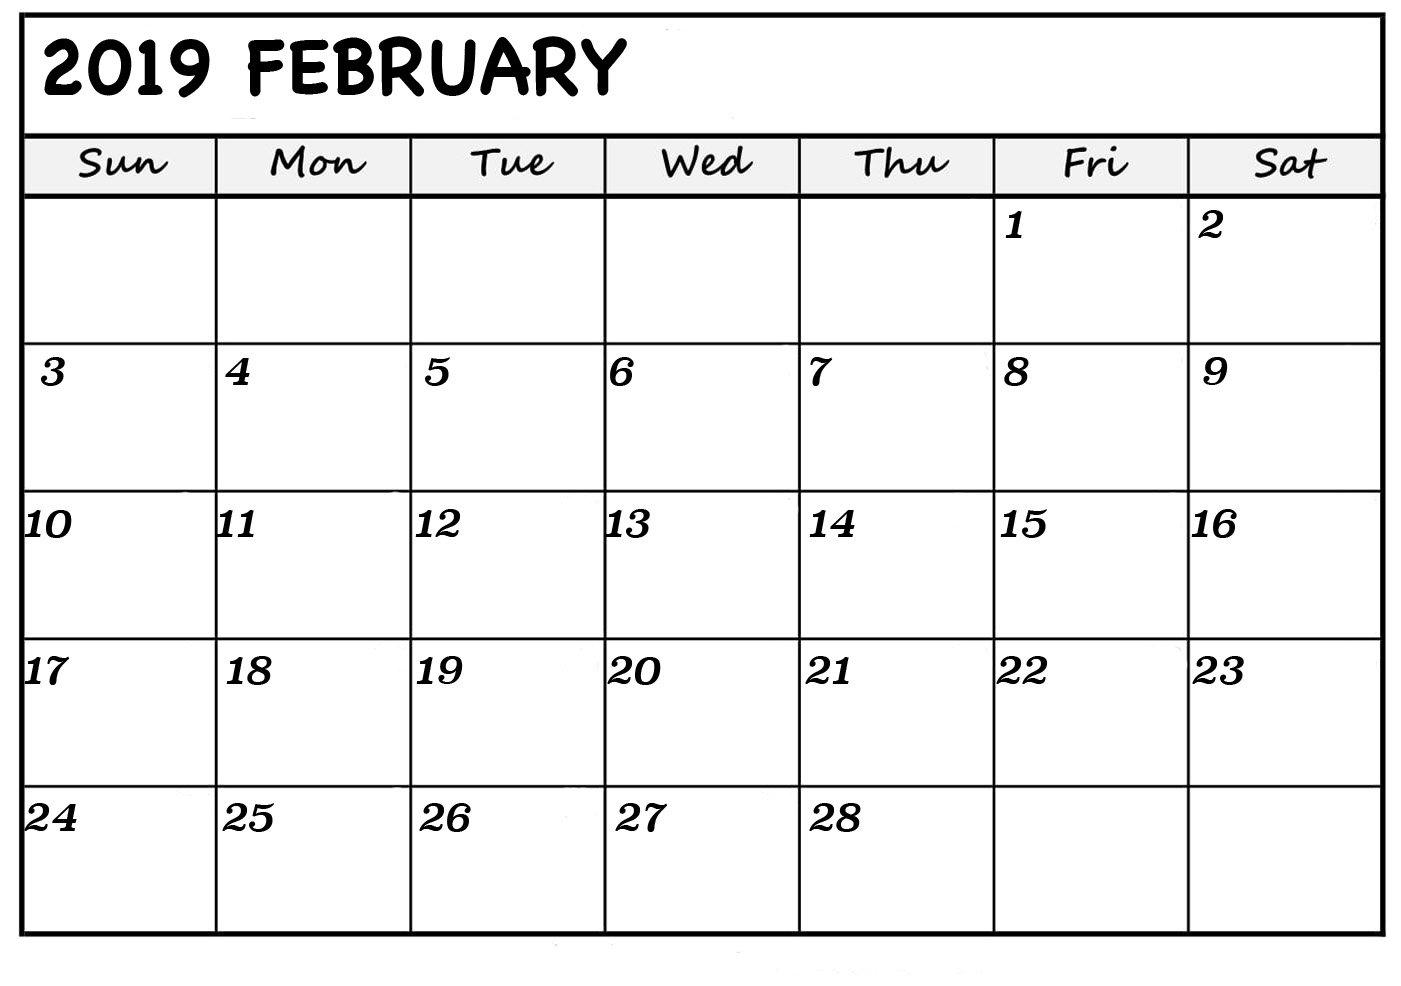 February 2019 Printable Calendars - Fresh Calendars Calendar 2019 February Printable